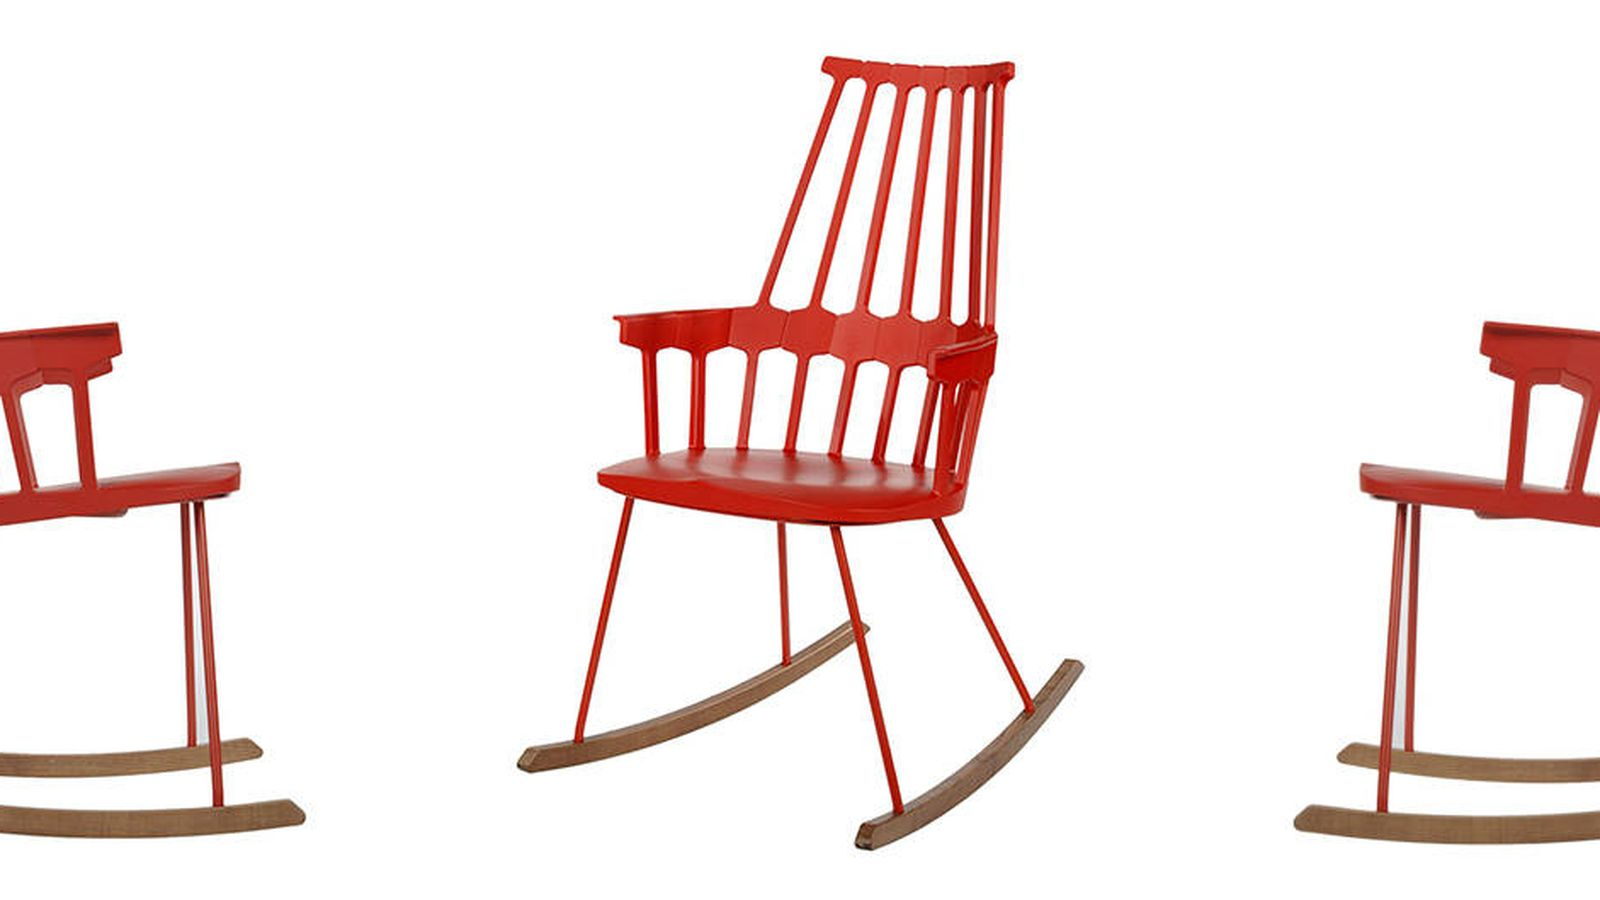 Foto: La silla 'Comback' de Patricia Urquiola para Kartell (Foto: Yoox.com)